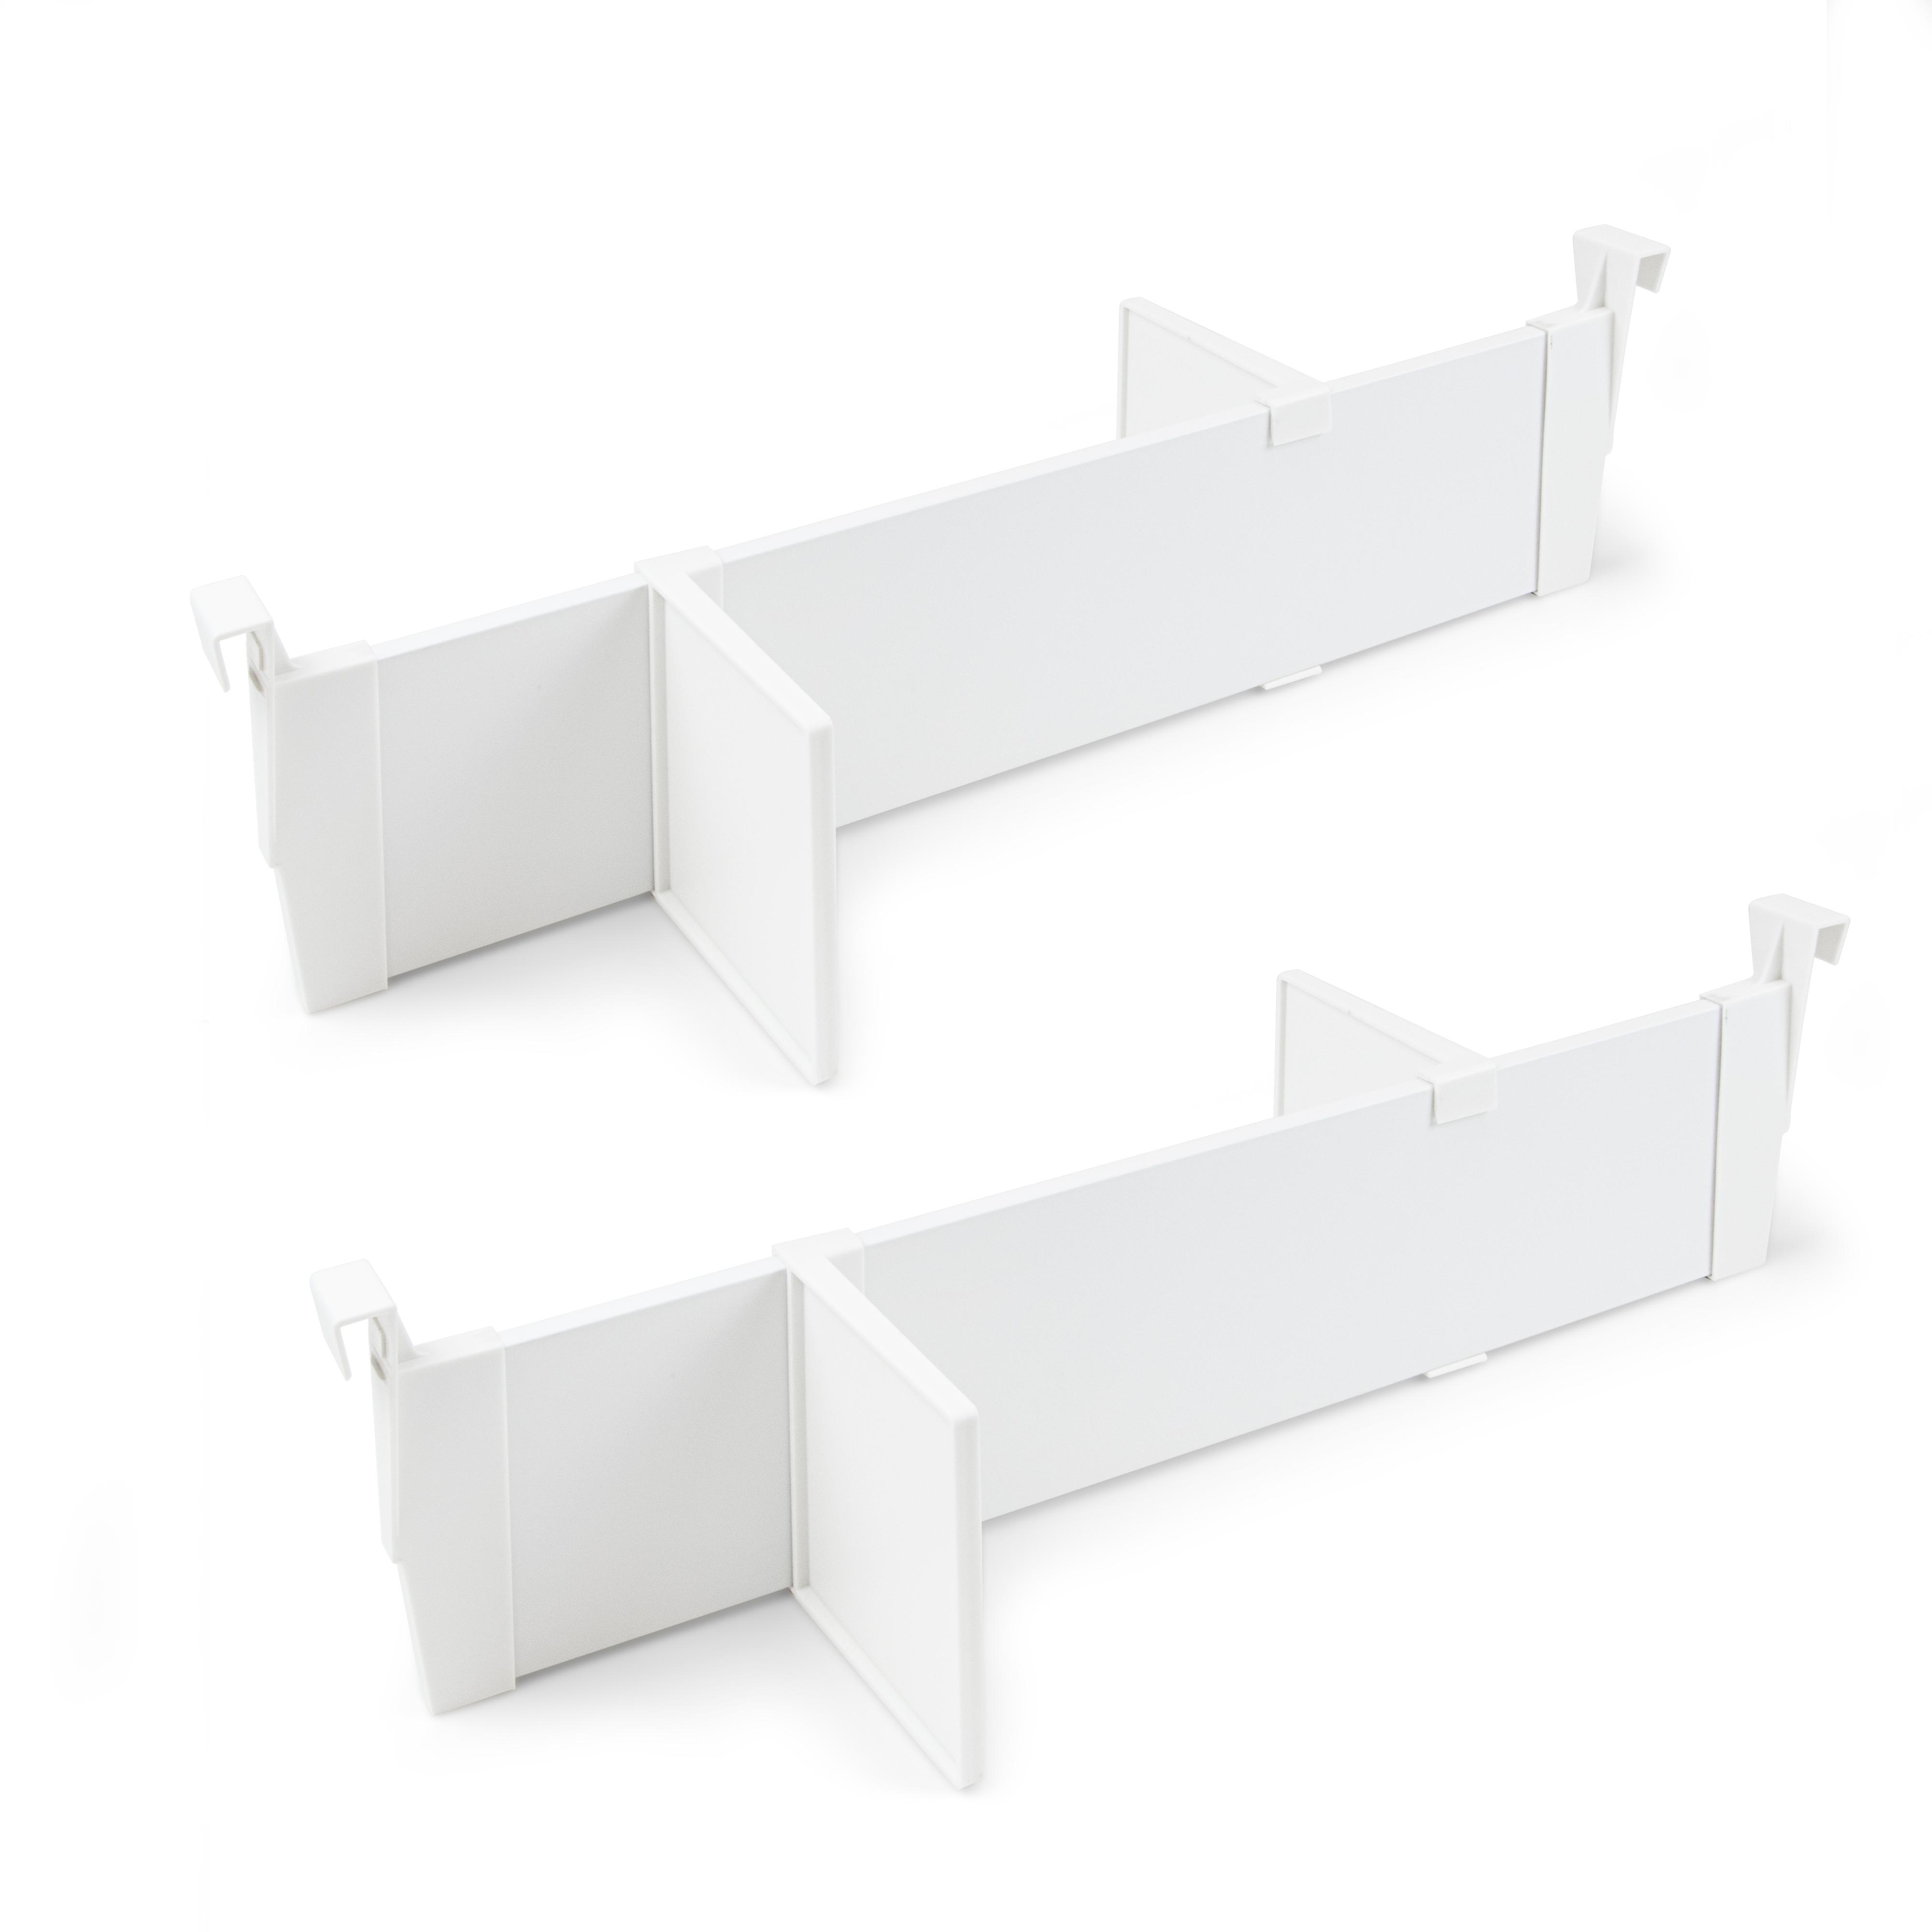 Emuca Set separatori regolabili per cassetti, accessori divisori organizer per cassetti 600mm, alluminio, bianco